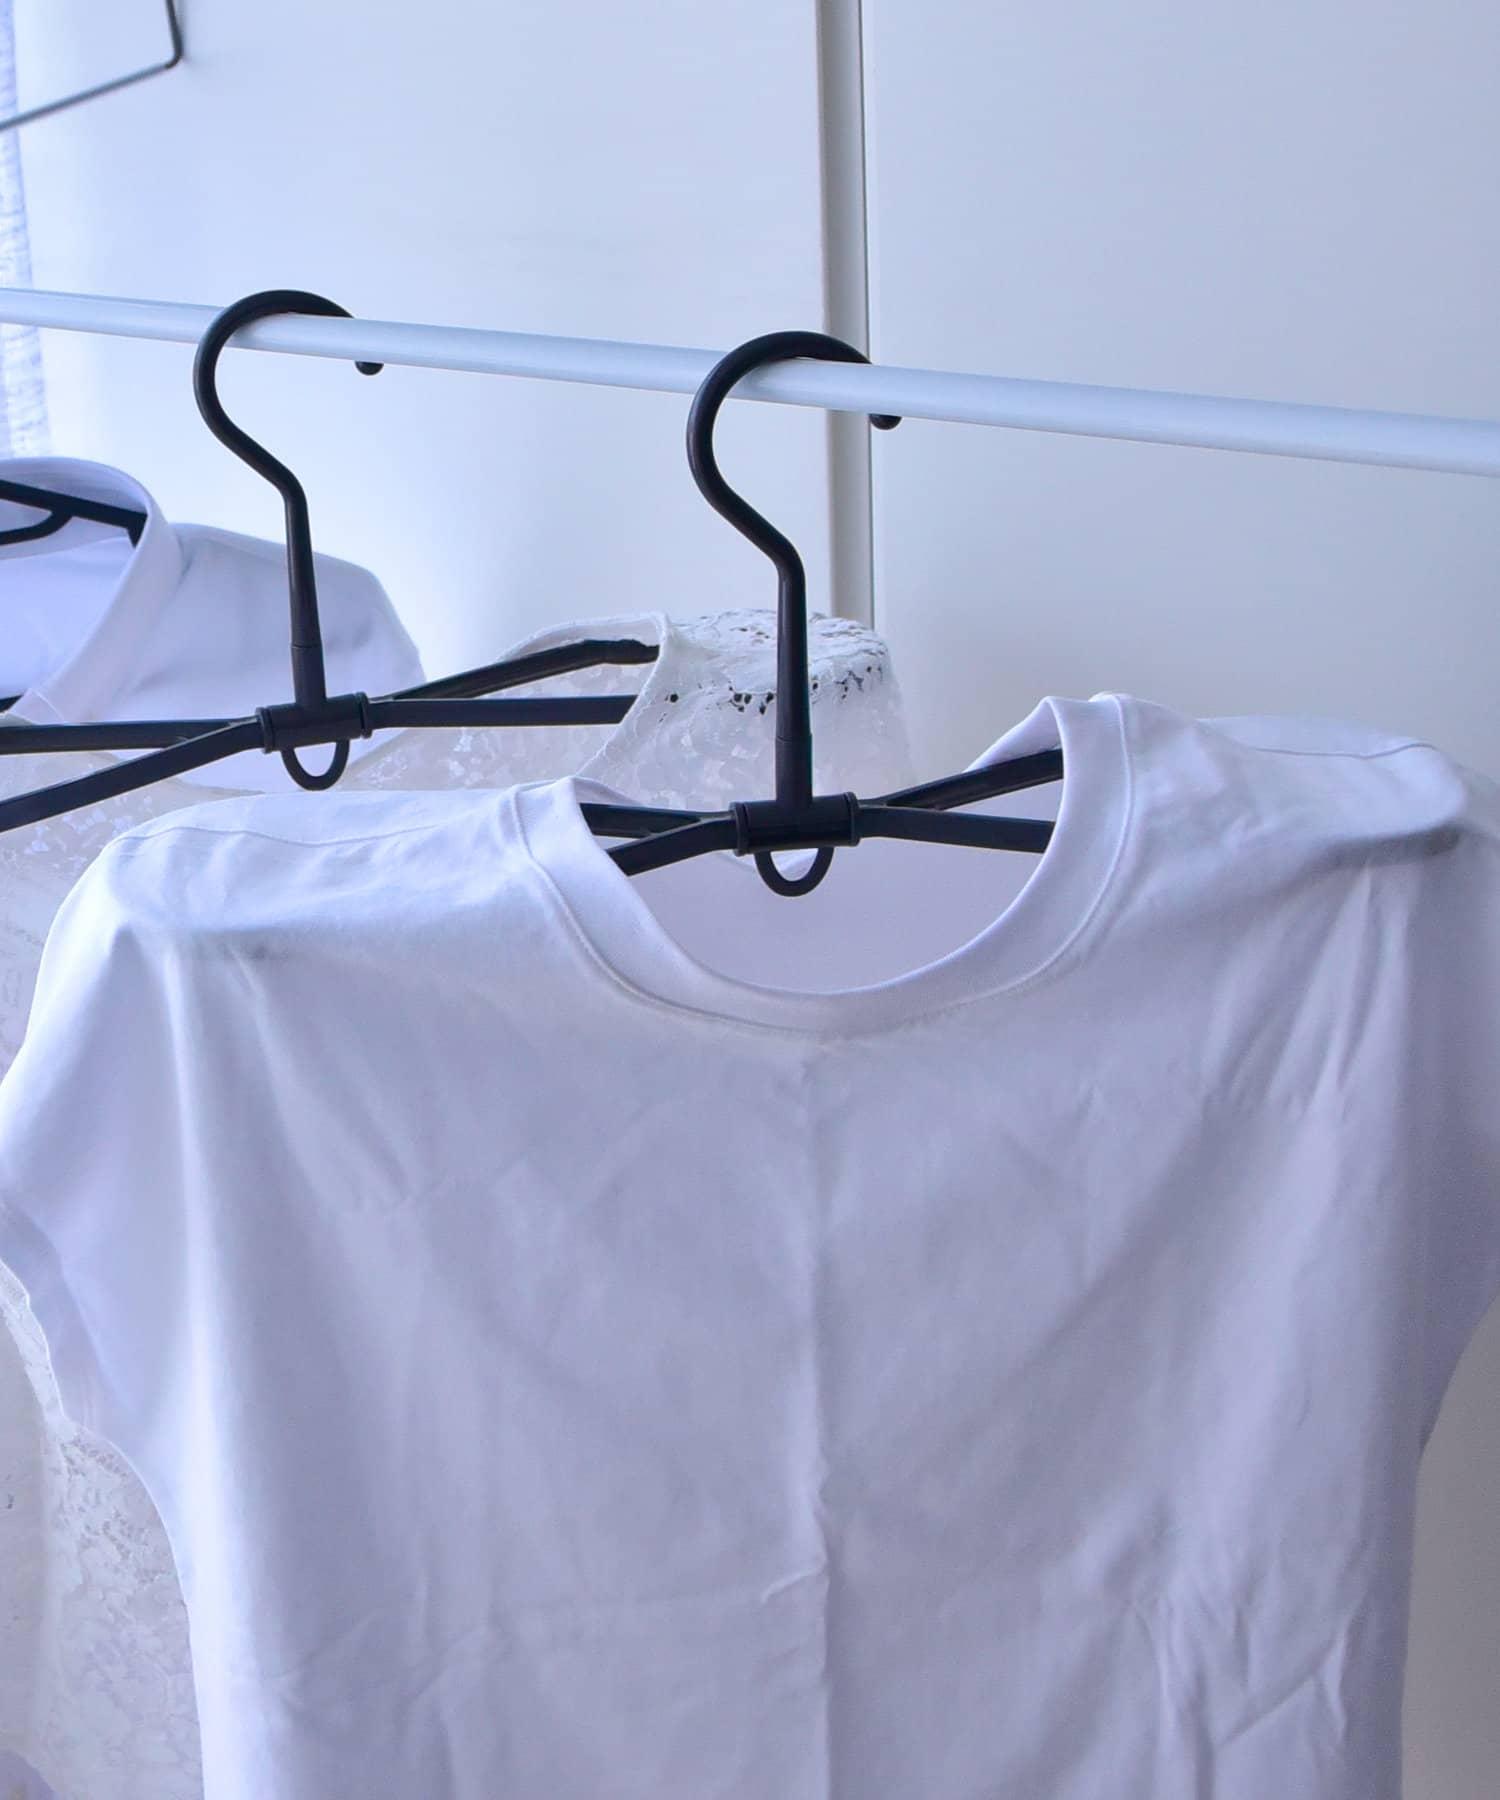 3COINS(スリーコインズ) 【梅雨でも快適】衣類が乾きやすいハンガー3本SET